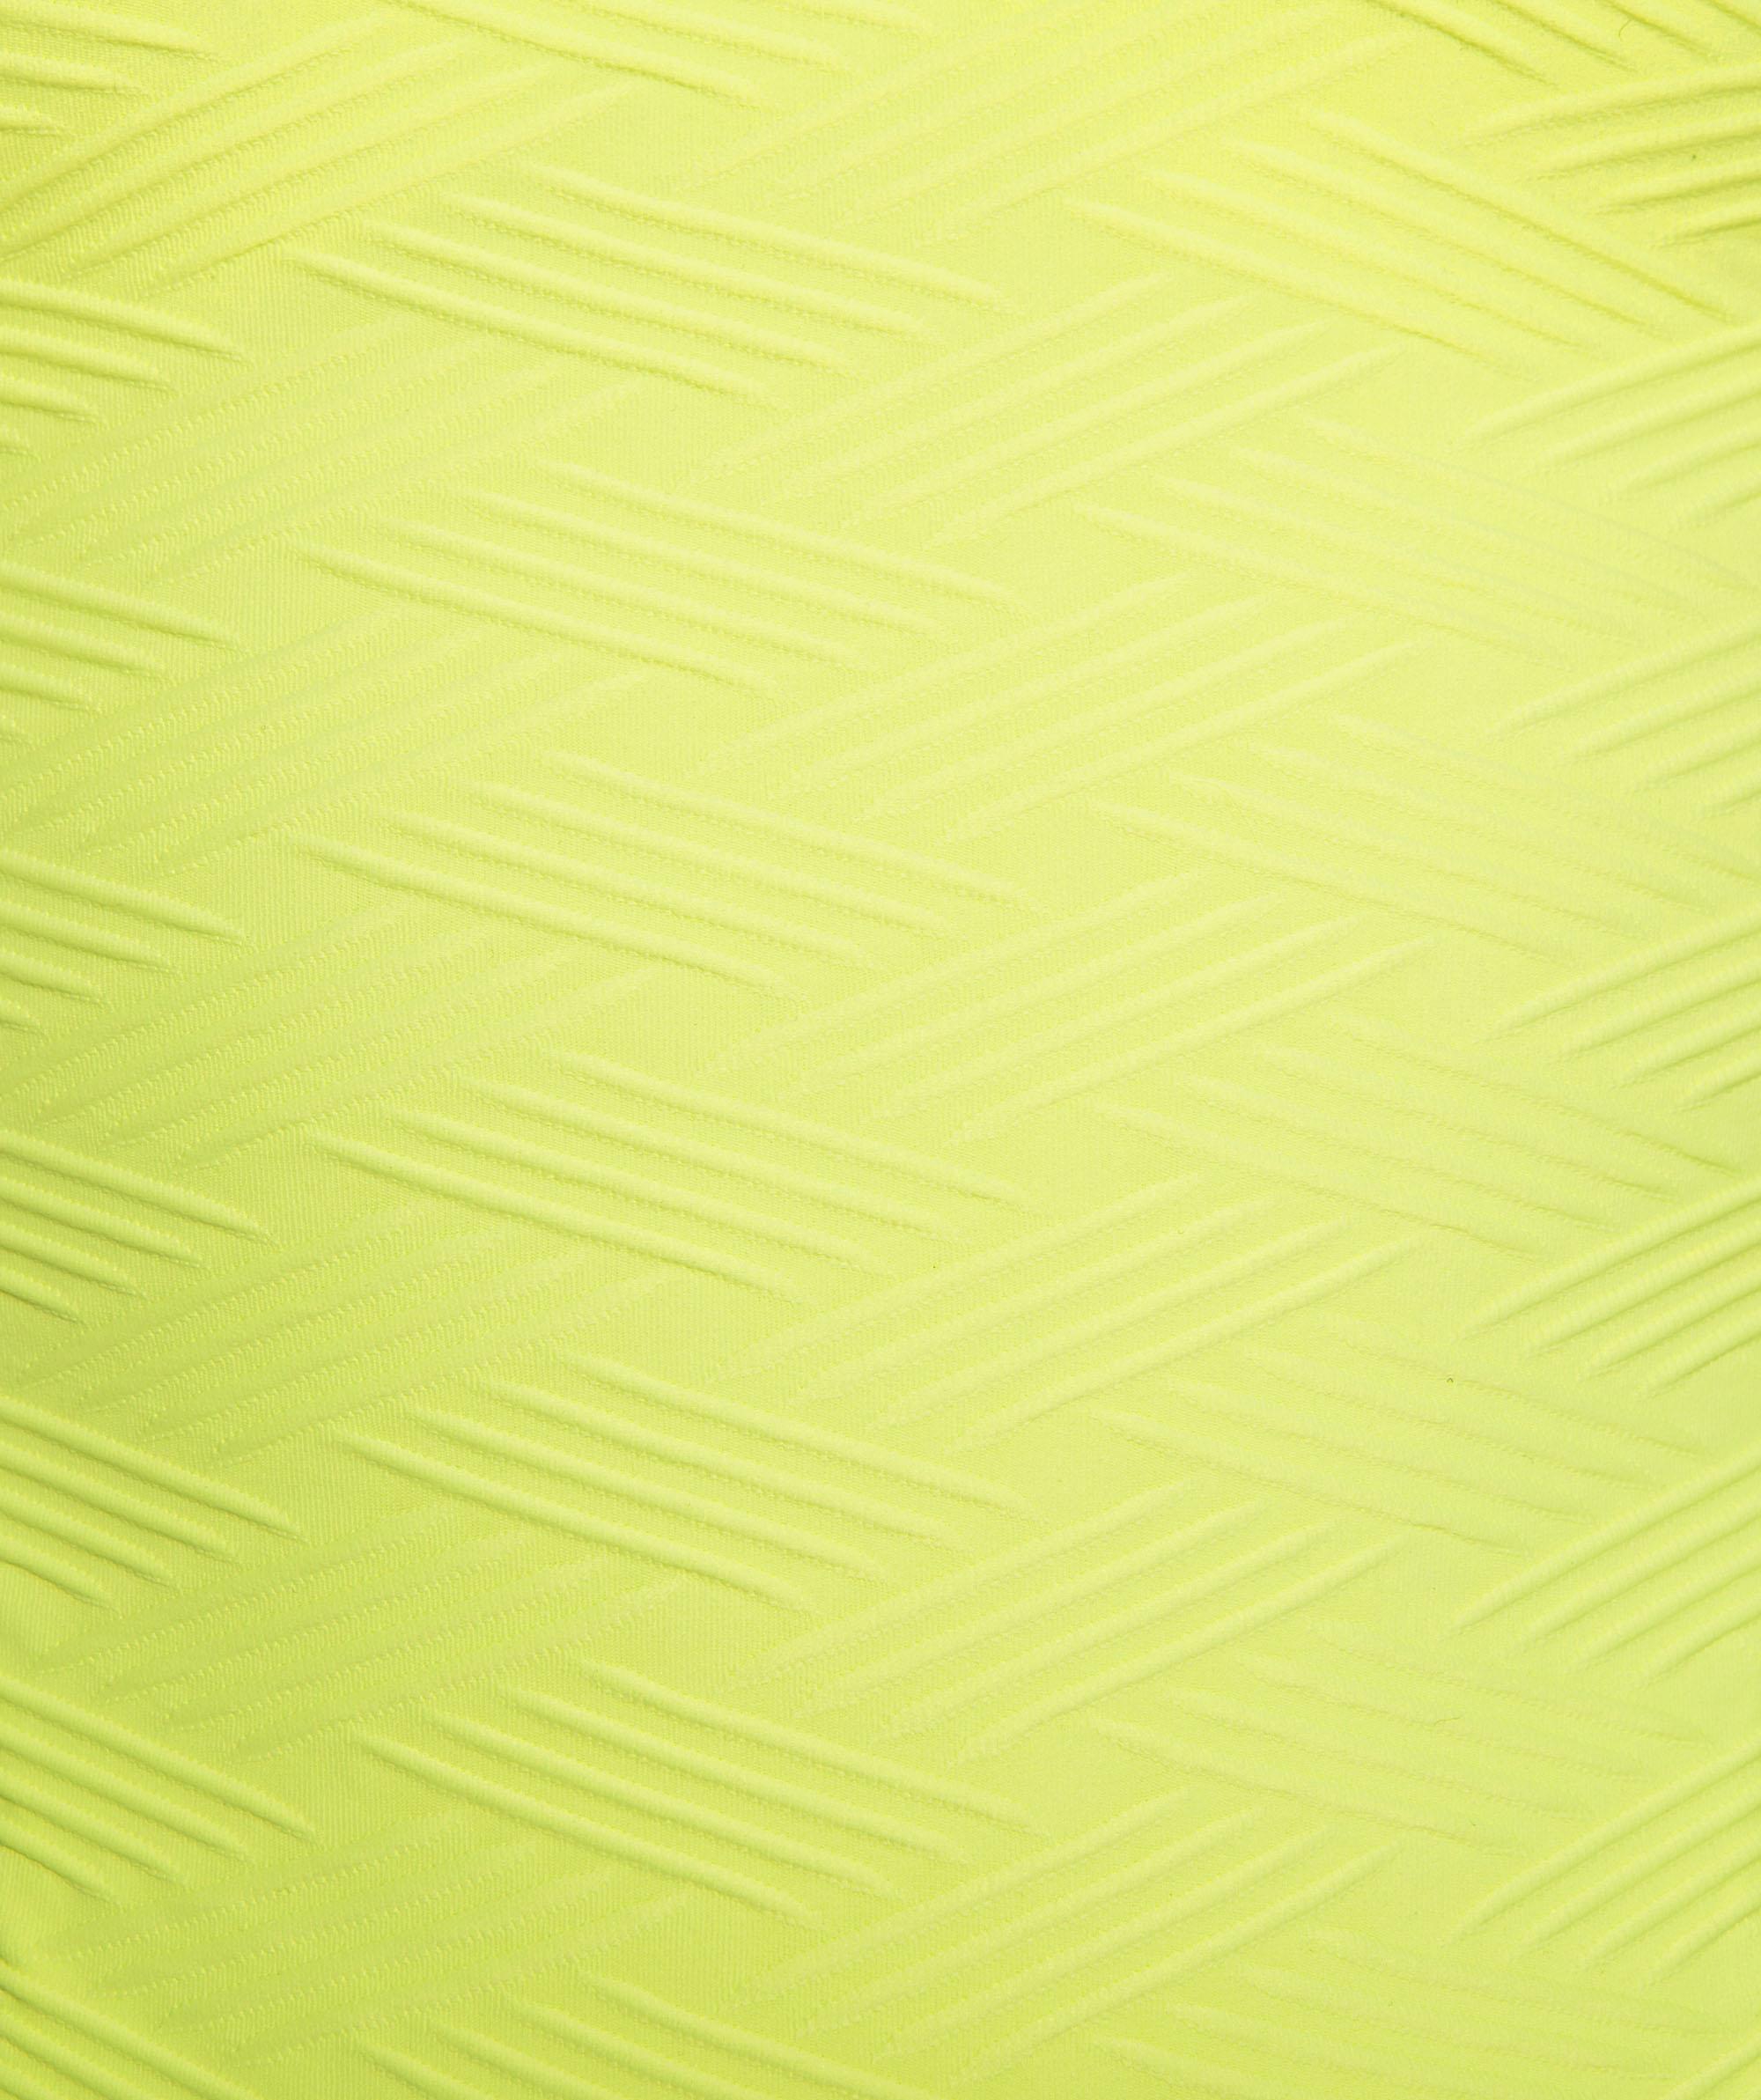 Vamp Vixen Cheeky Swim Bottoms - Light Yellow